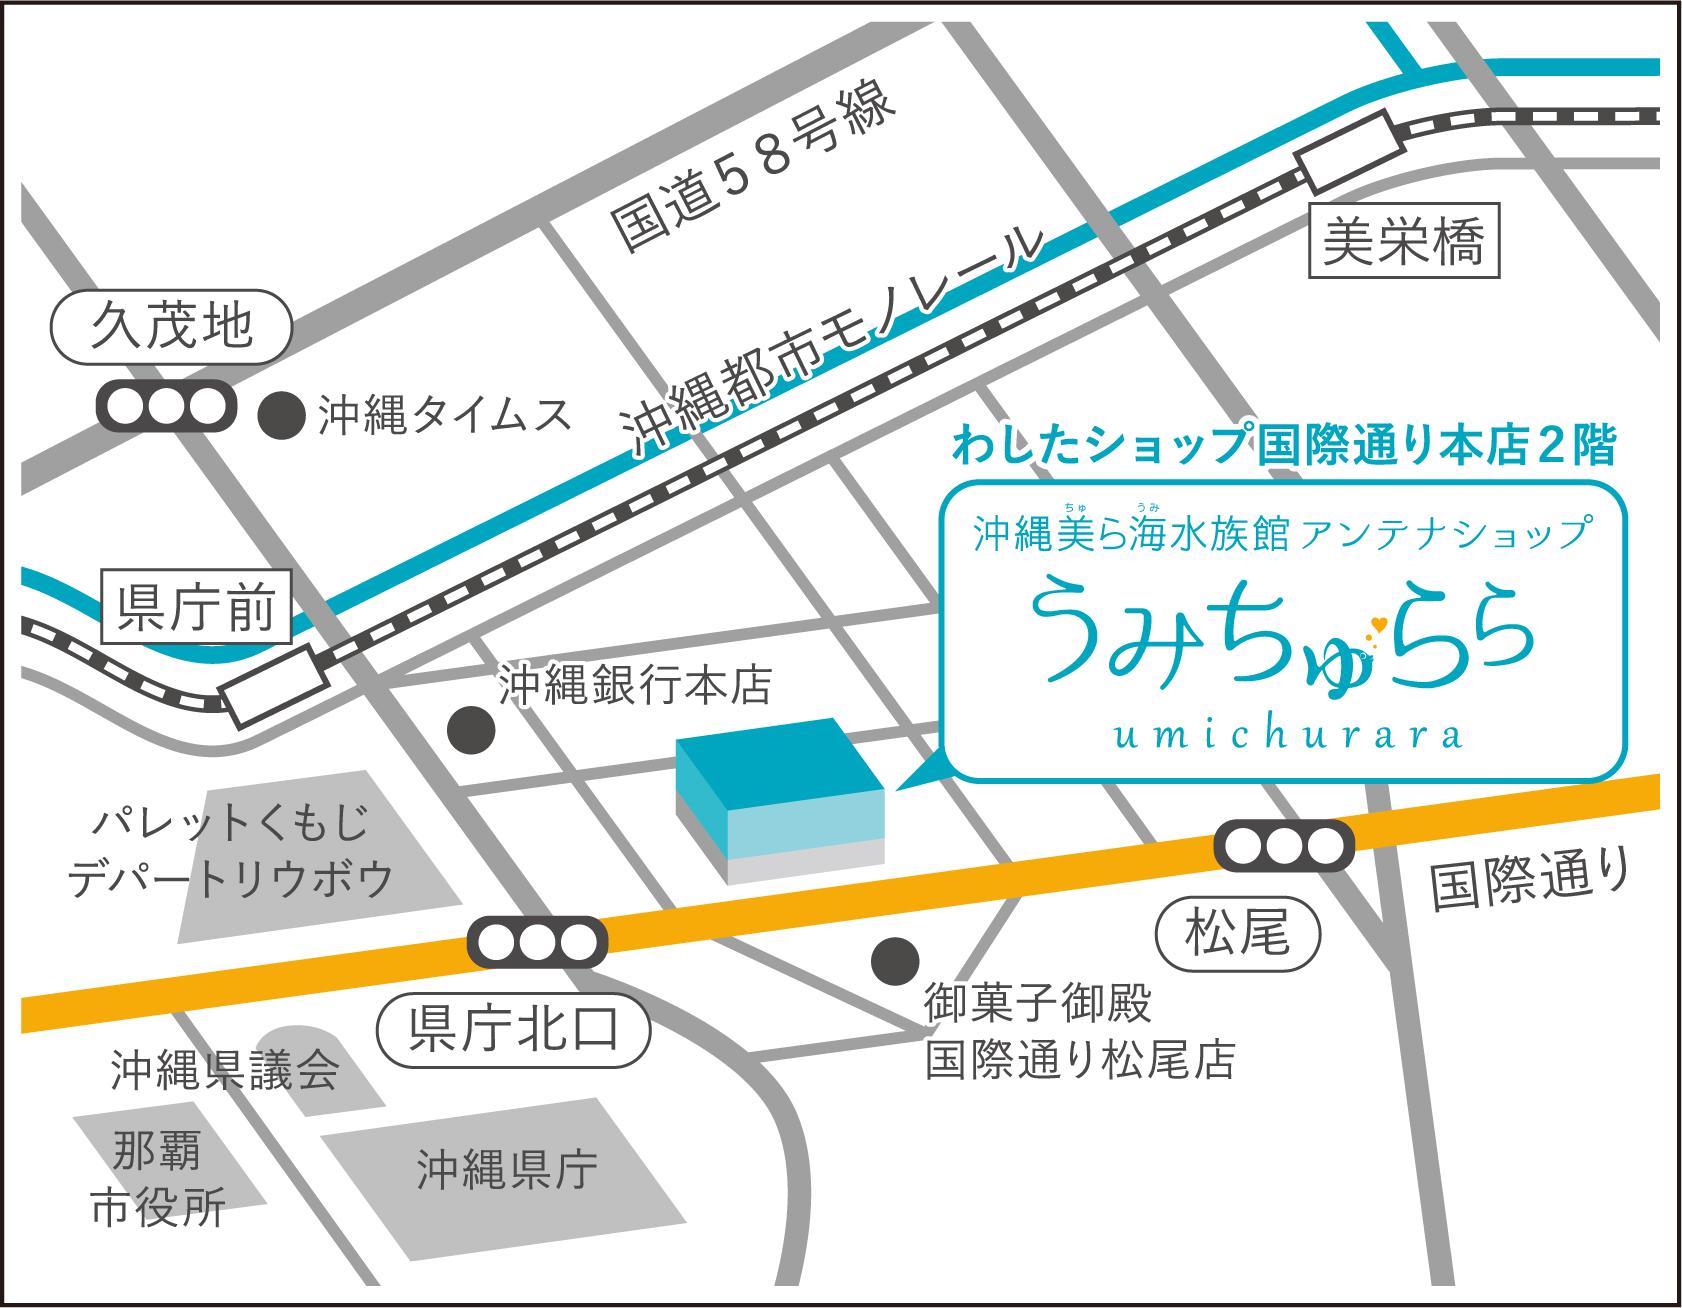 http://www.vill.zamami.okinawa.jp/info/%E3%81%86%E3%81%BF%E3%81%A1%E3%82%85%E3%82%89%E3%82%89%E5%9C%B0%E5%9B%B3.jpg